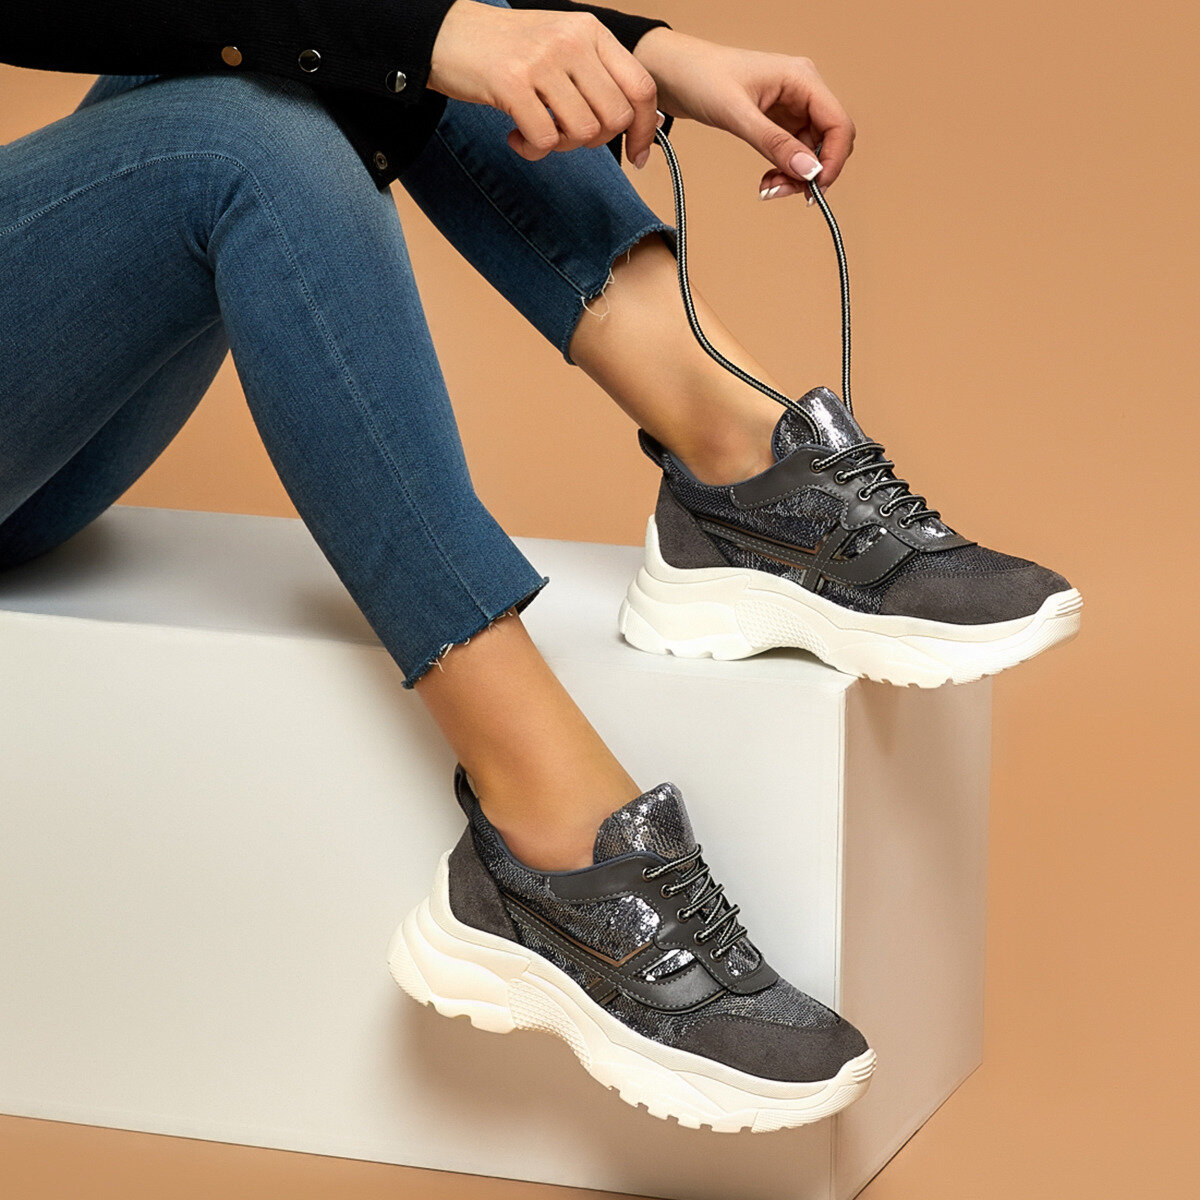 FLO Women's Sneakers Casual Spring Summer Women Fashion Sneakers Vulcanized Shoes BUTIGO NUVO Gray